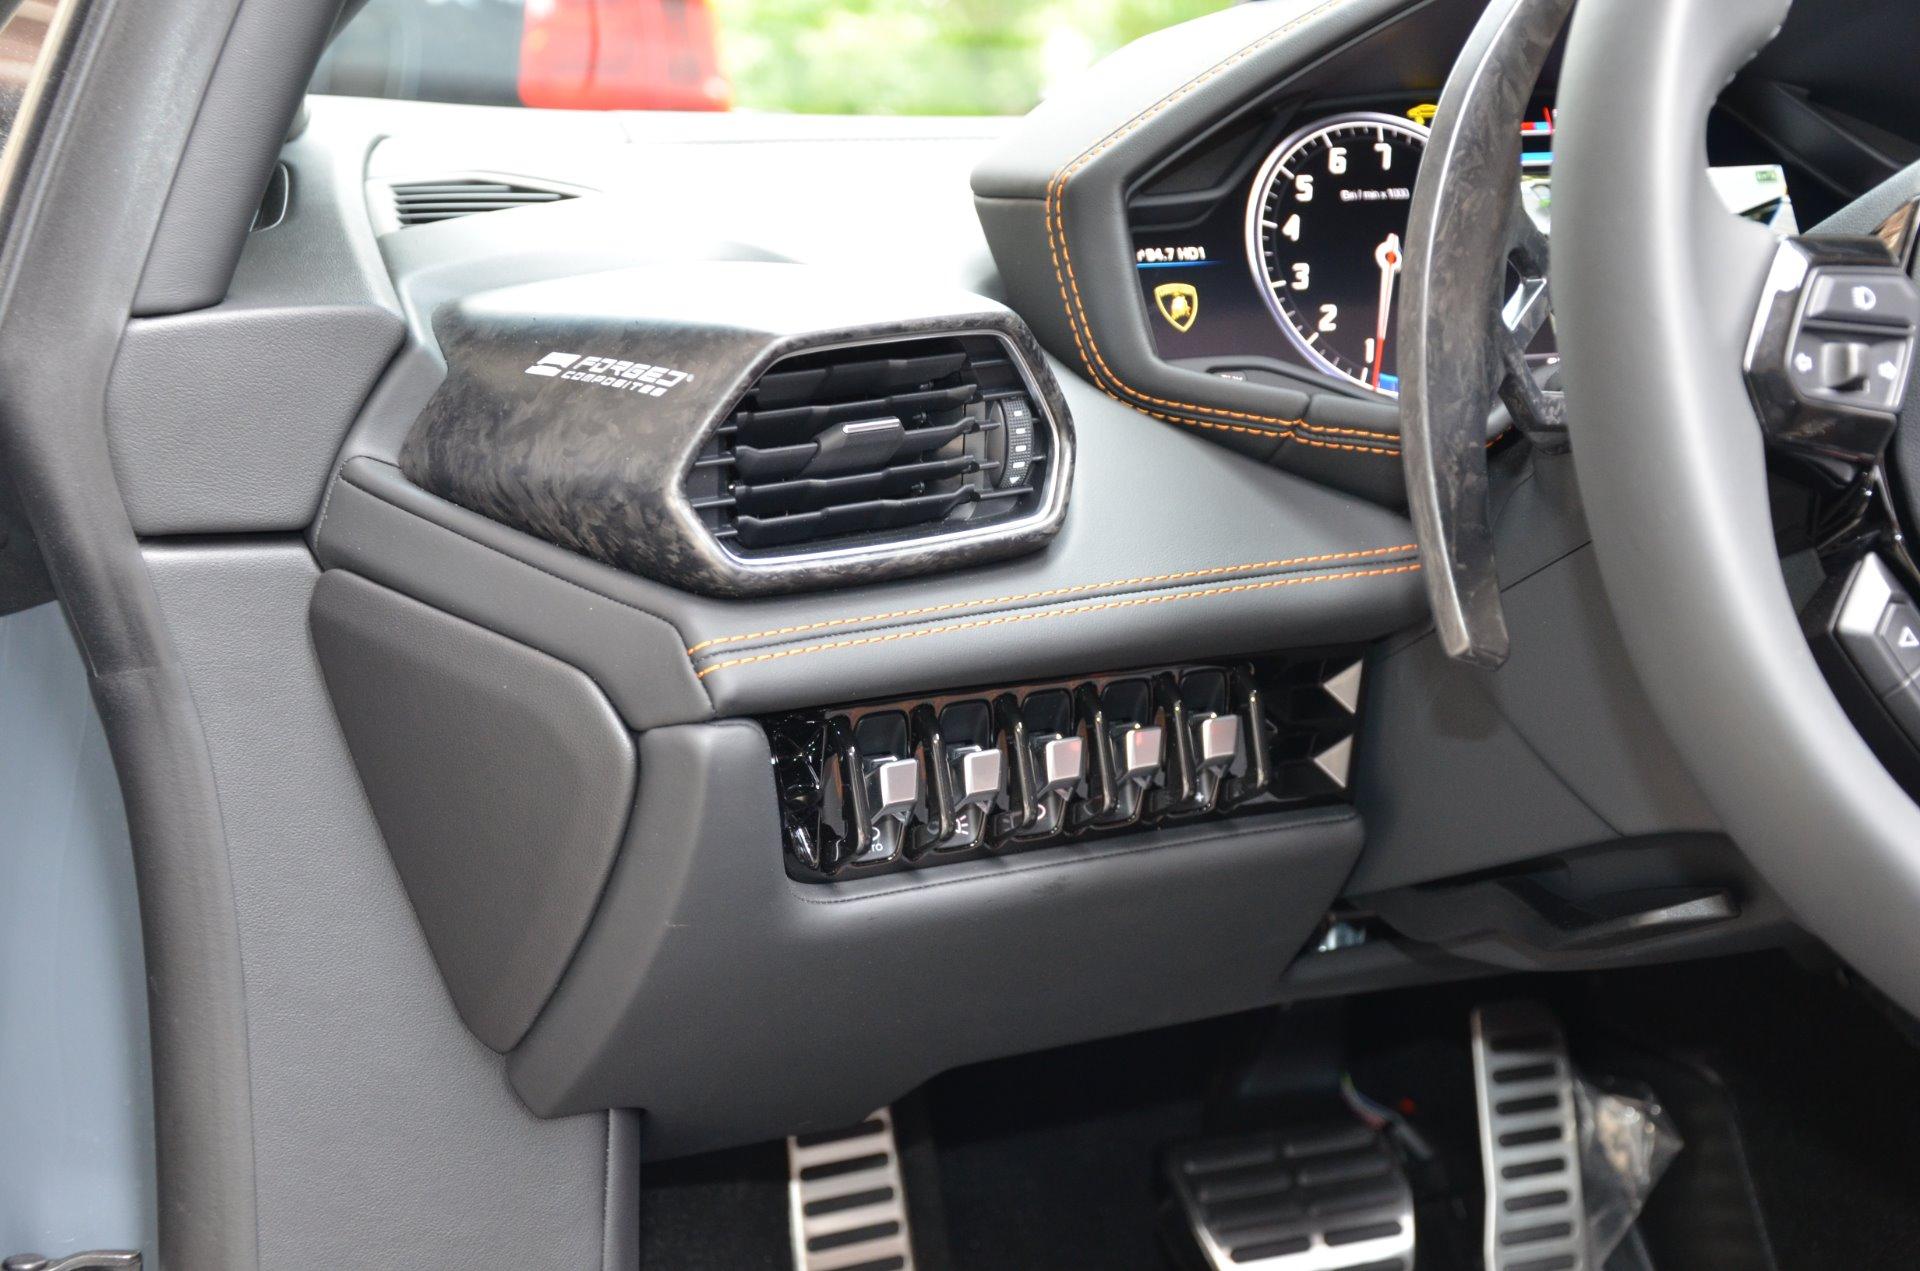 system paket used on cars superveloce lifting jamesedition lp sound carbon for aventador sale lamborghini